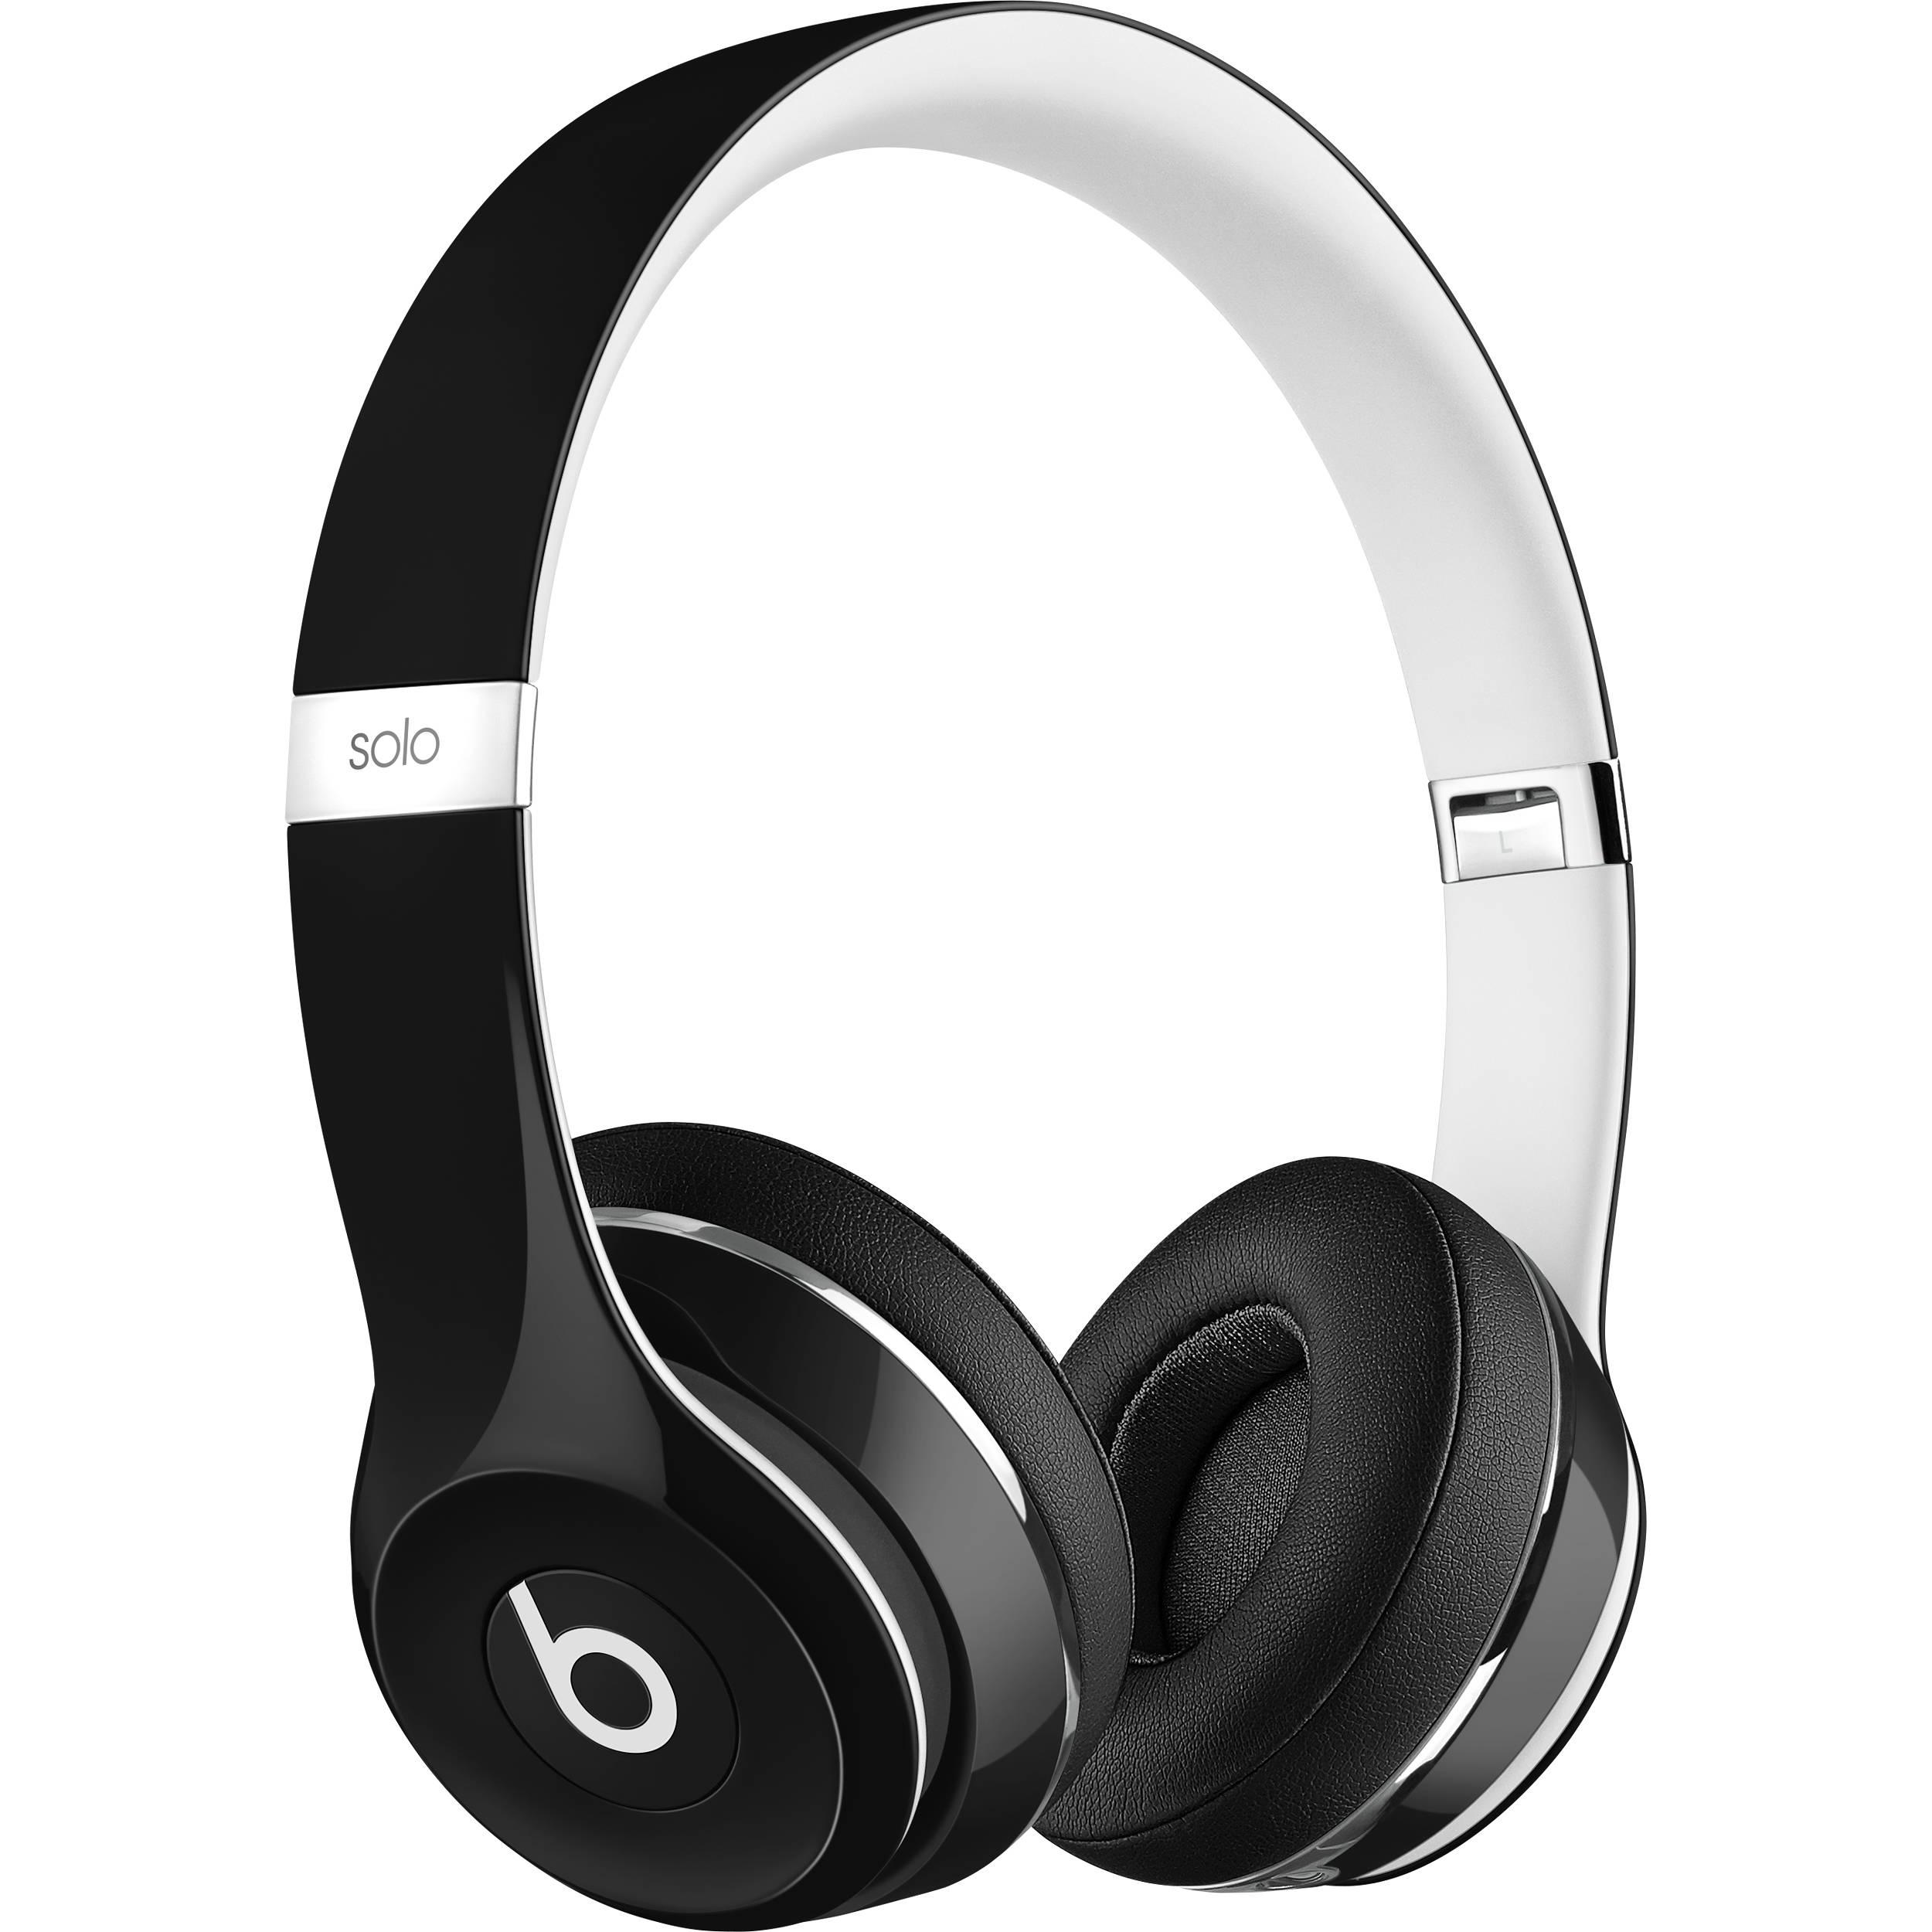 beats_by_dr_dre_ml9e2am_a_solo2_on_ear_headphones_luxe_1203893.jpg